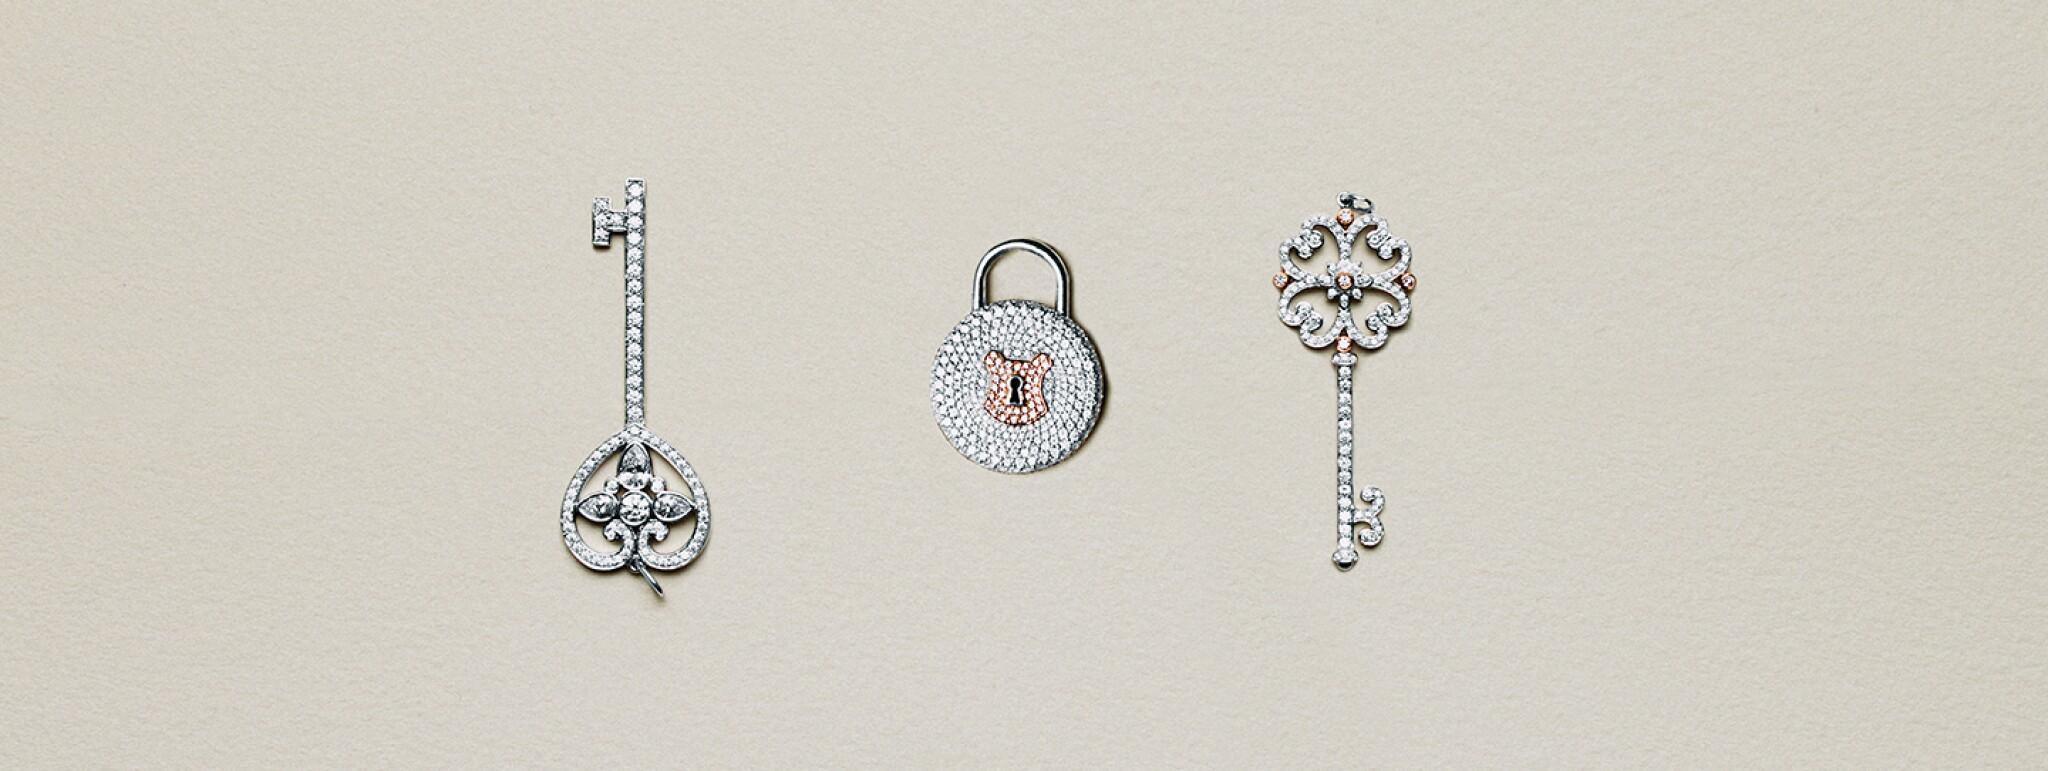 Tiffany & Co. | Jewels Online